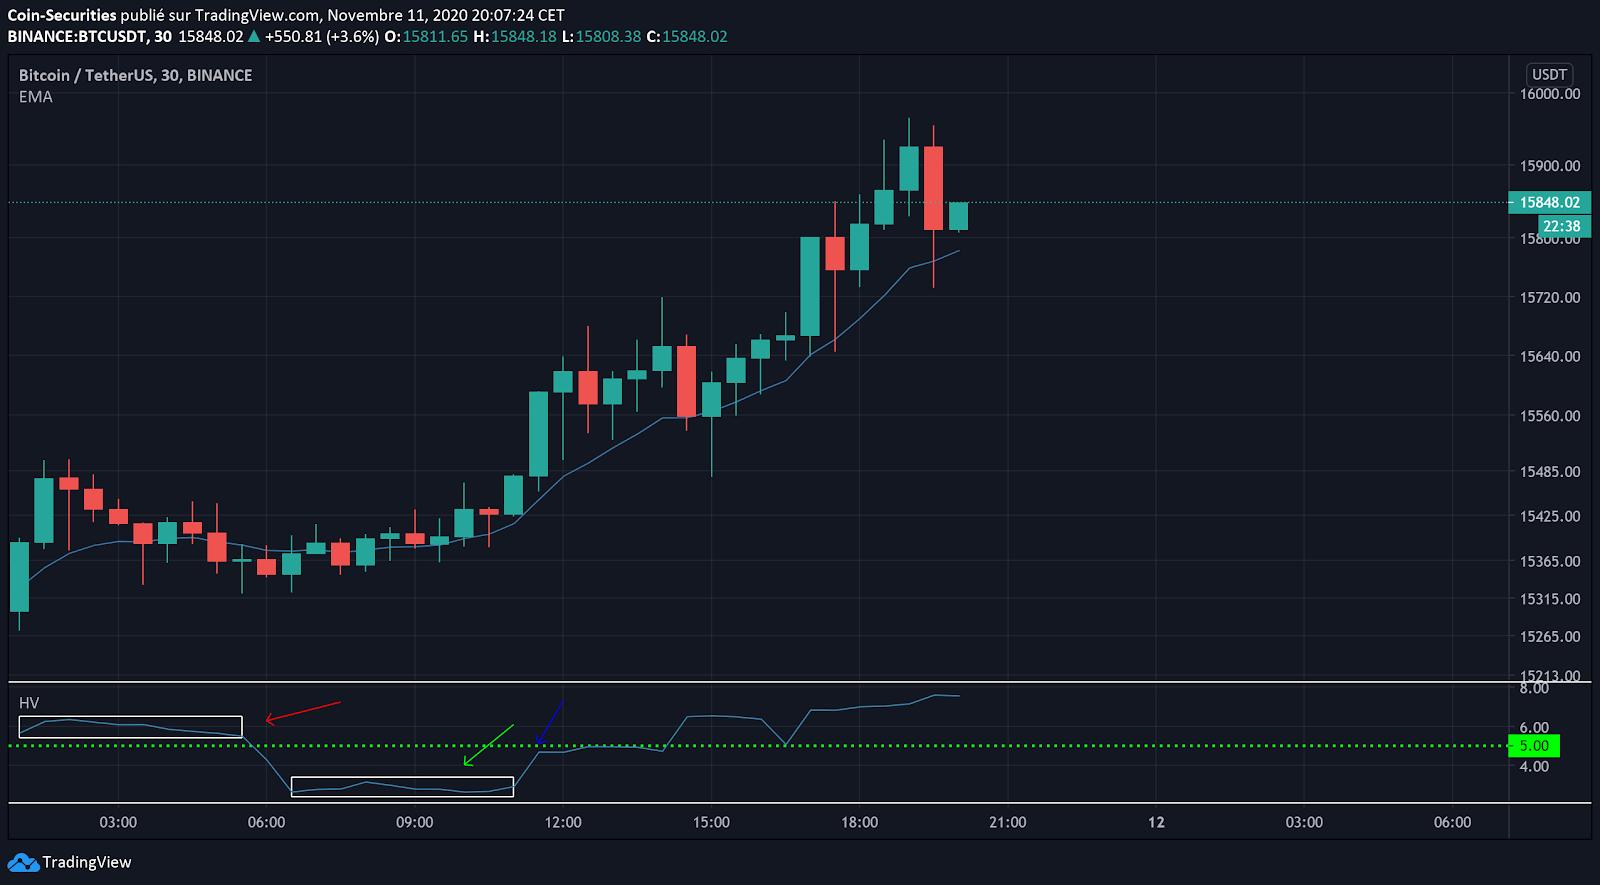 Bitcoin price prediction: BTC/USDT has $16,000 in sight but bears grow stronger 3